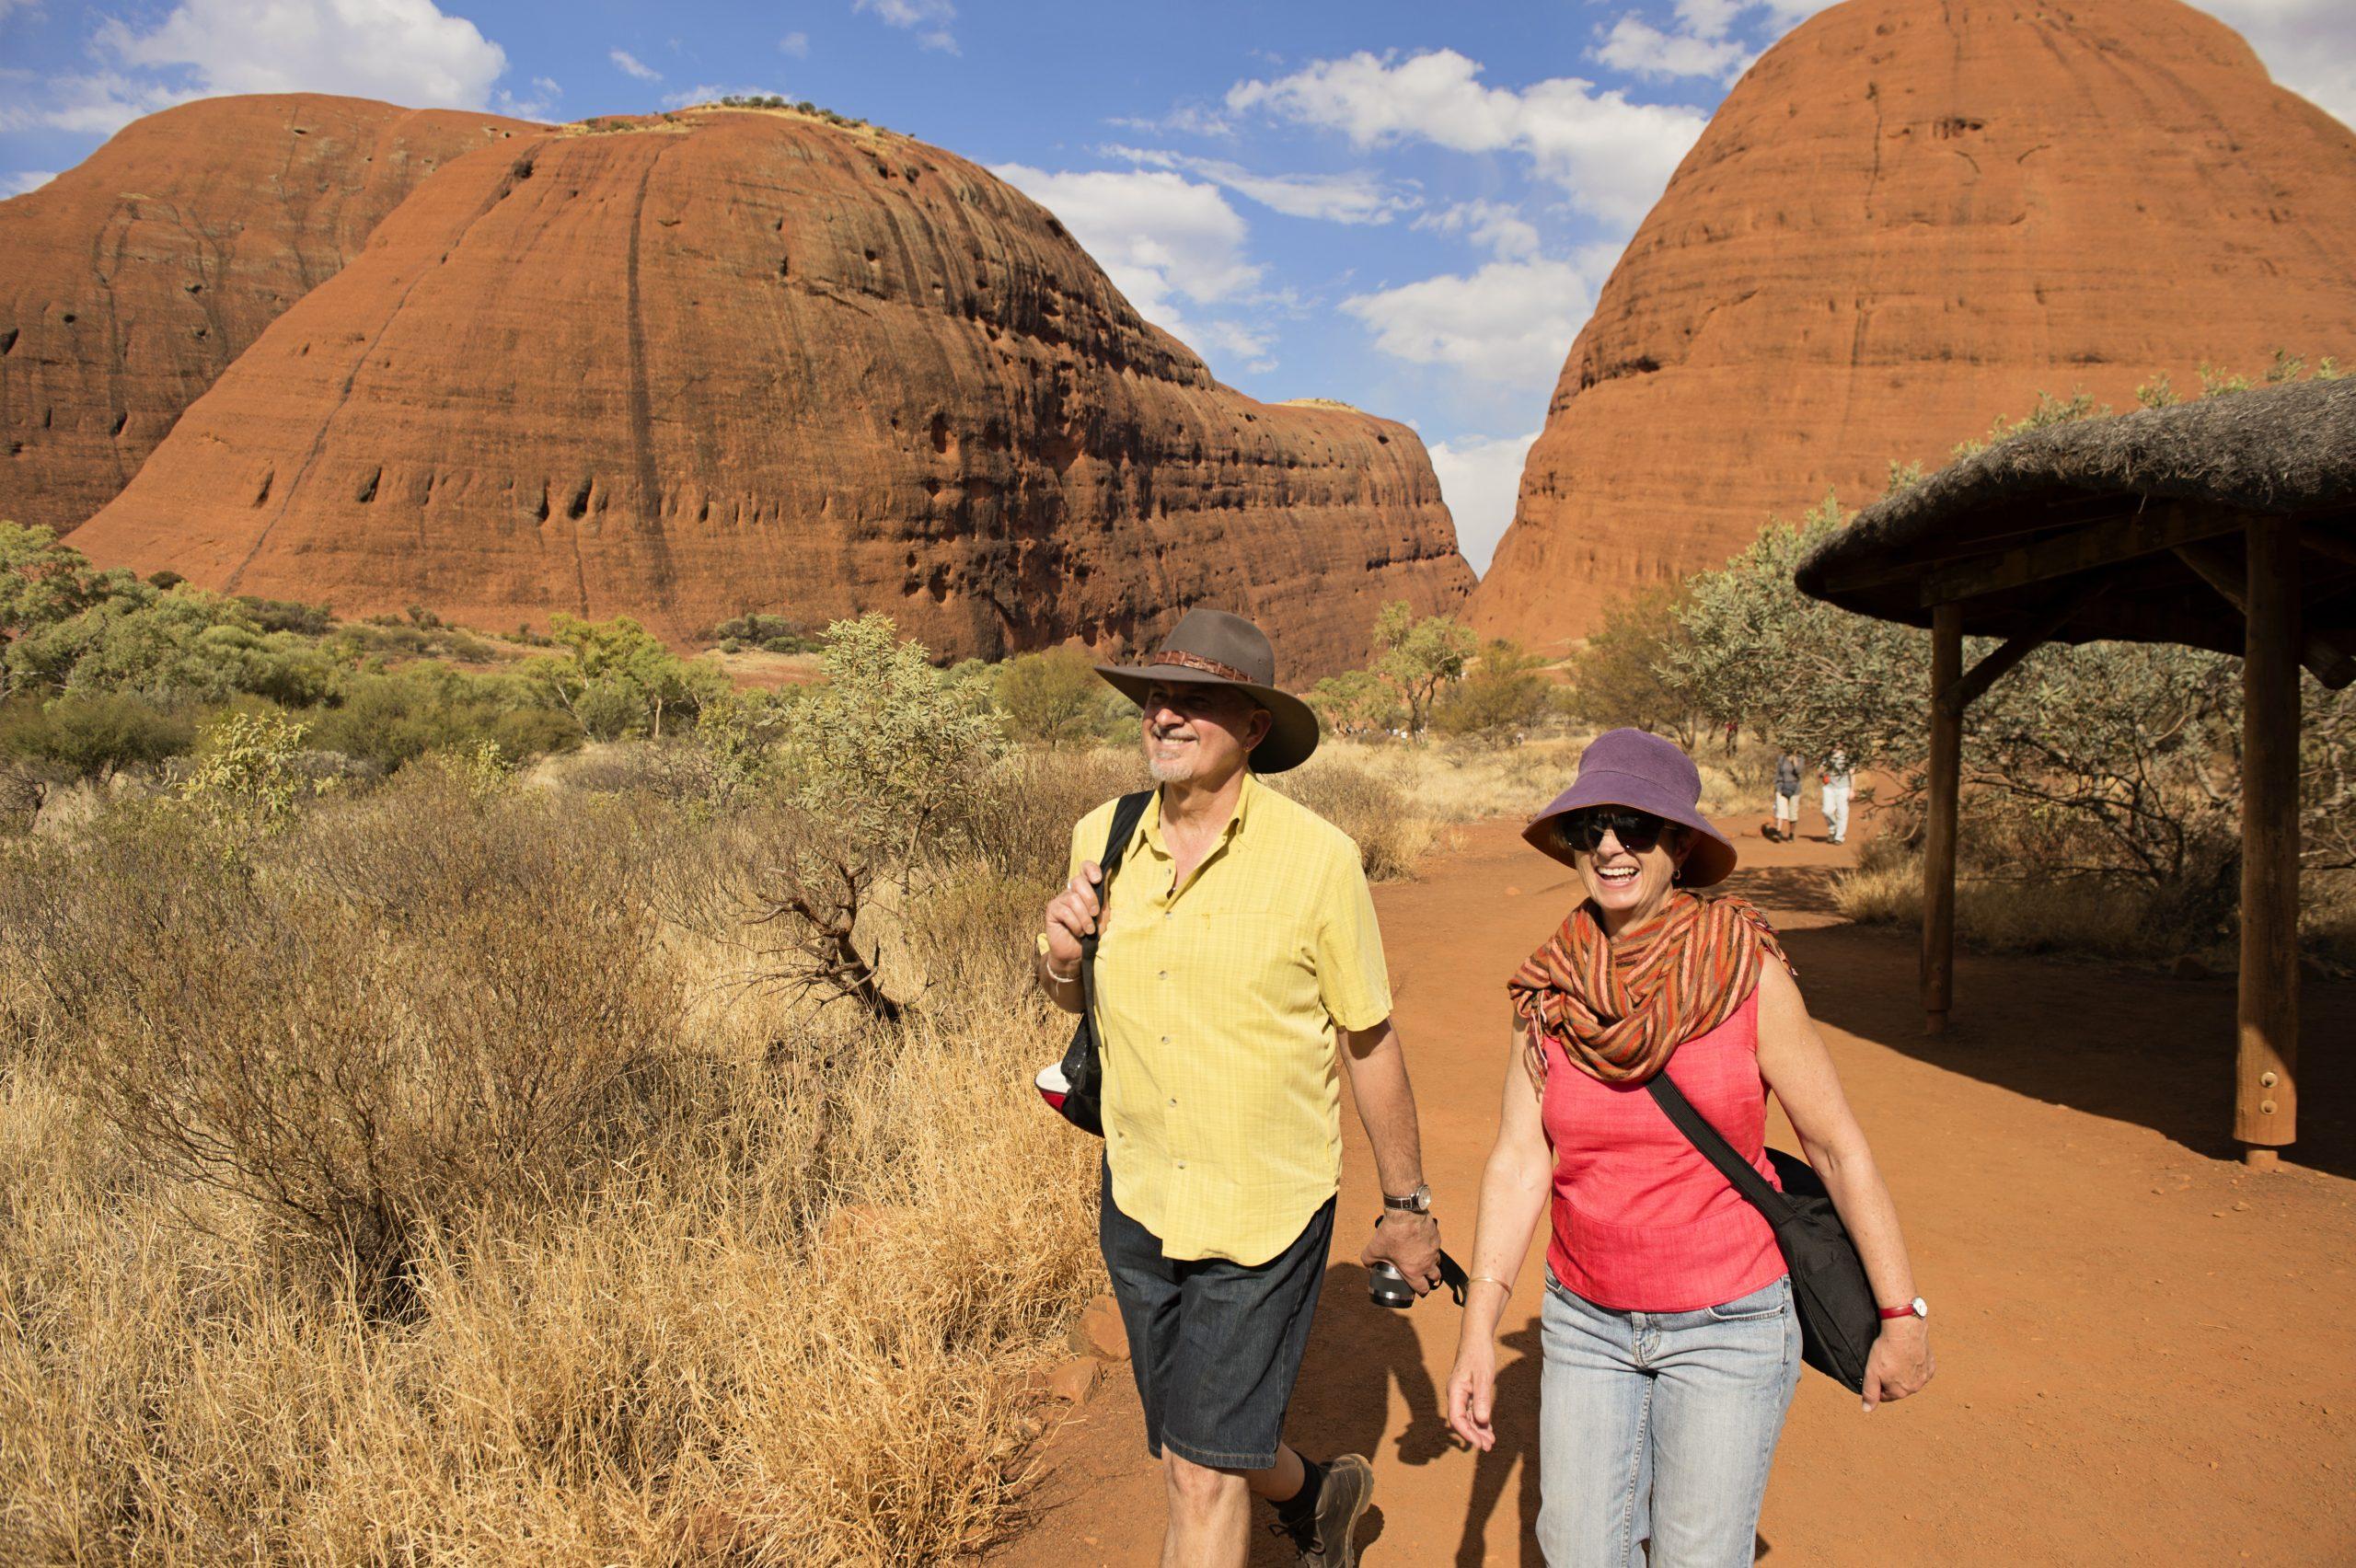 Uluru & Kata Tjuta Highlights | Walpa Gorge, Kata Tjuta, Northern Territory